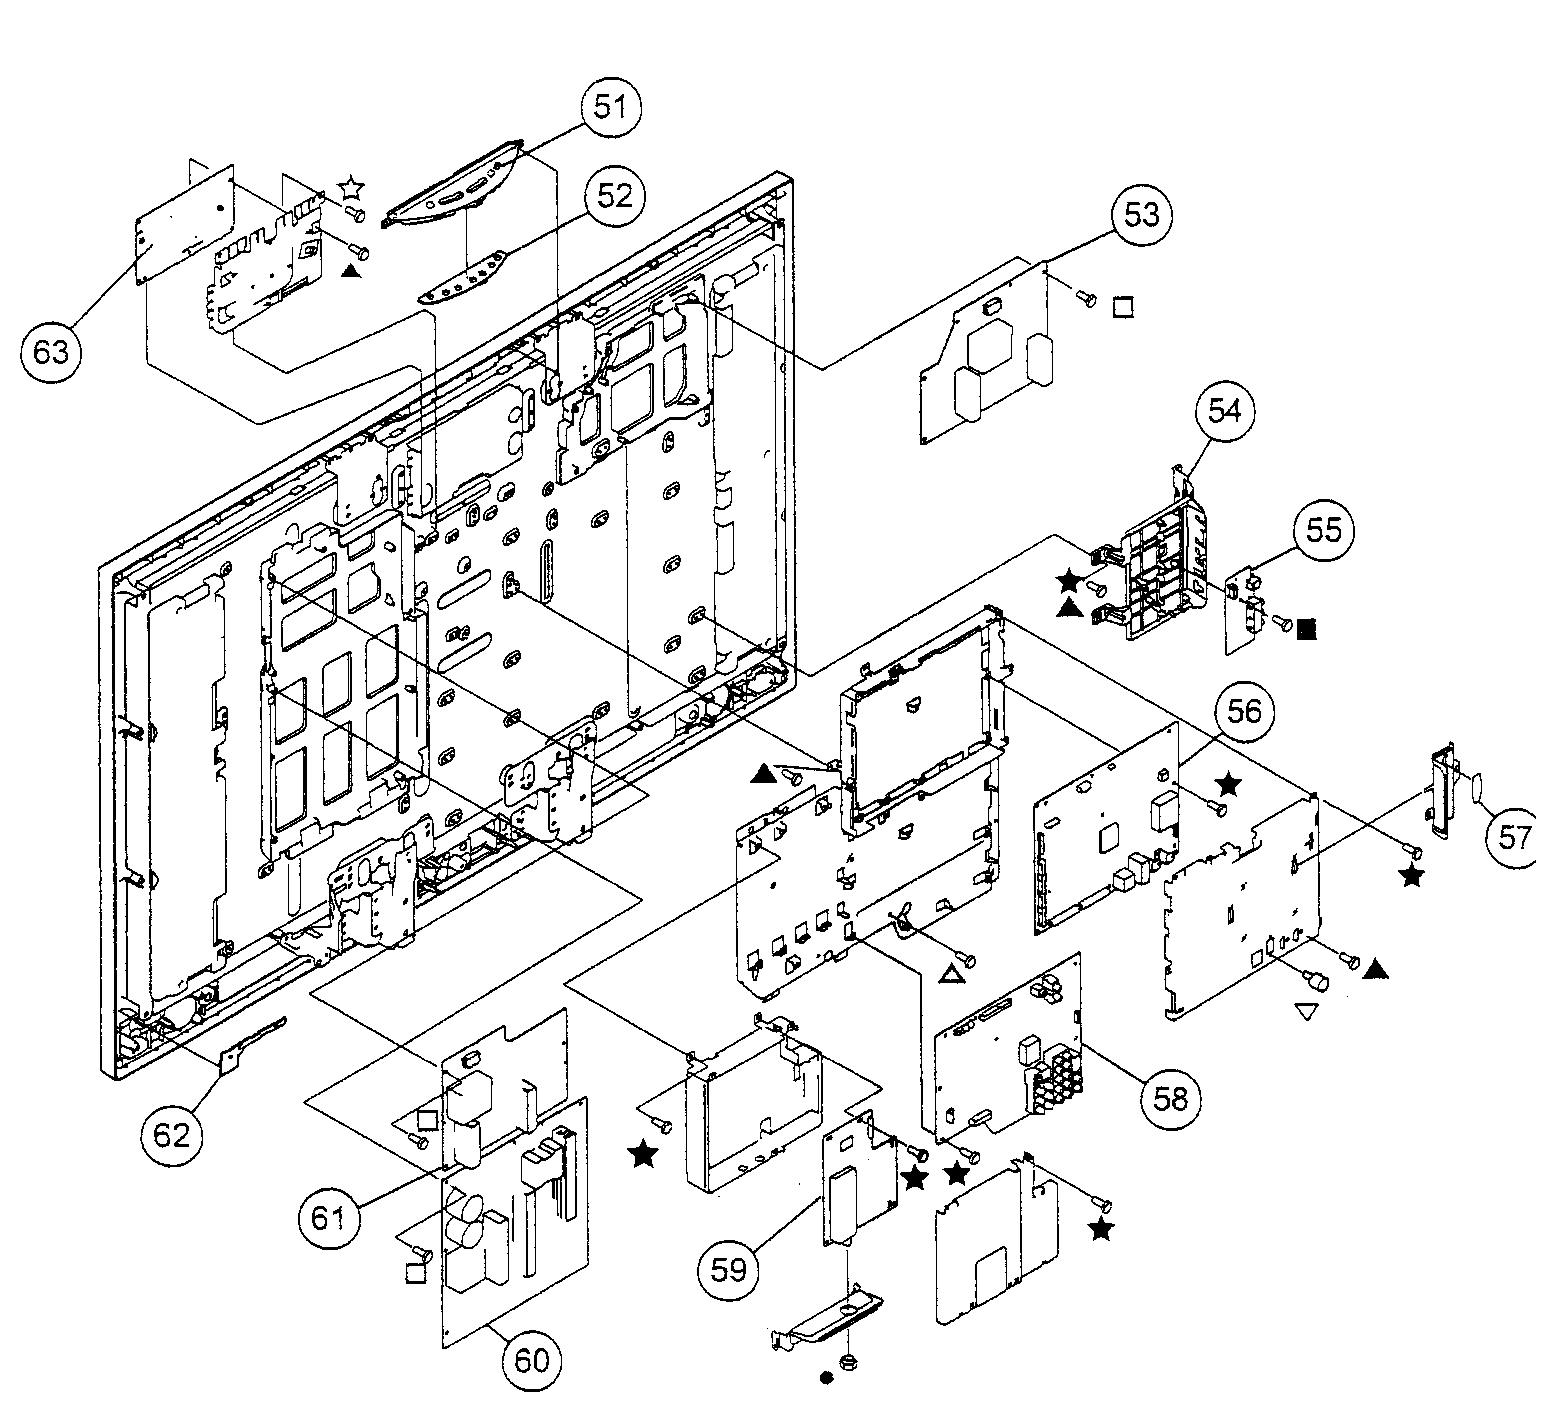 Sony model KDL-46WL135 lcd television genuine parts